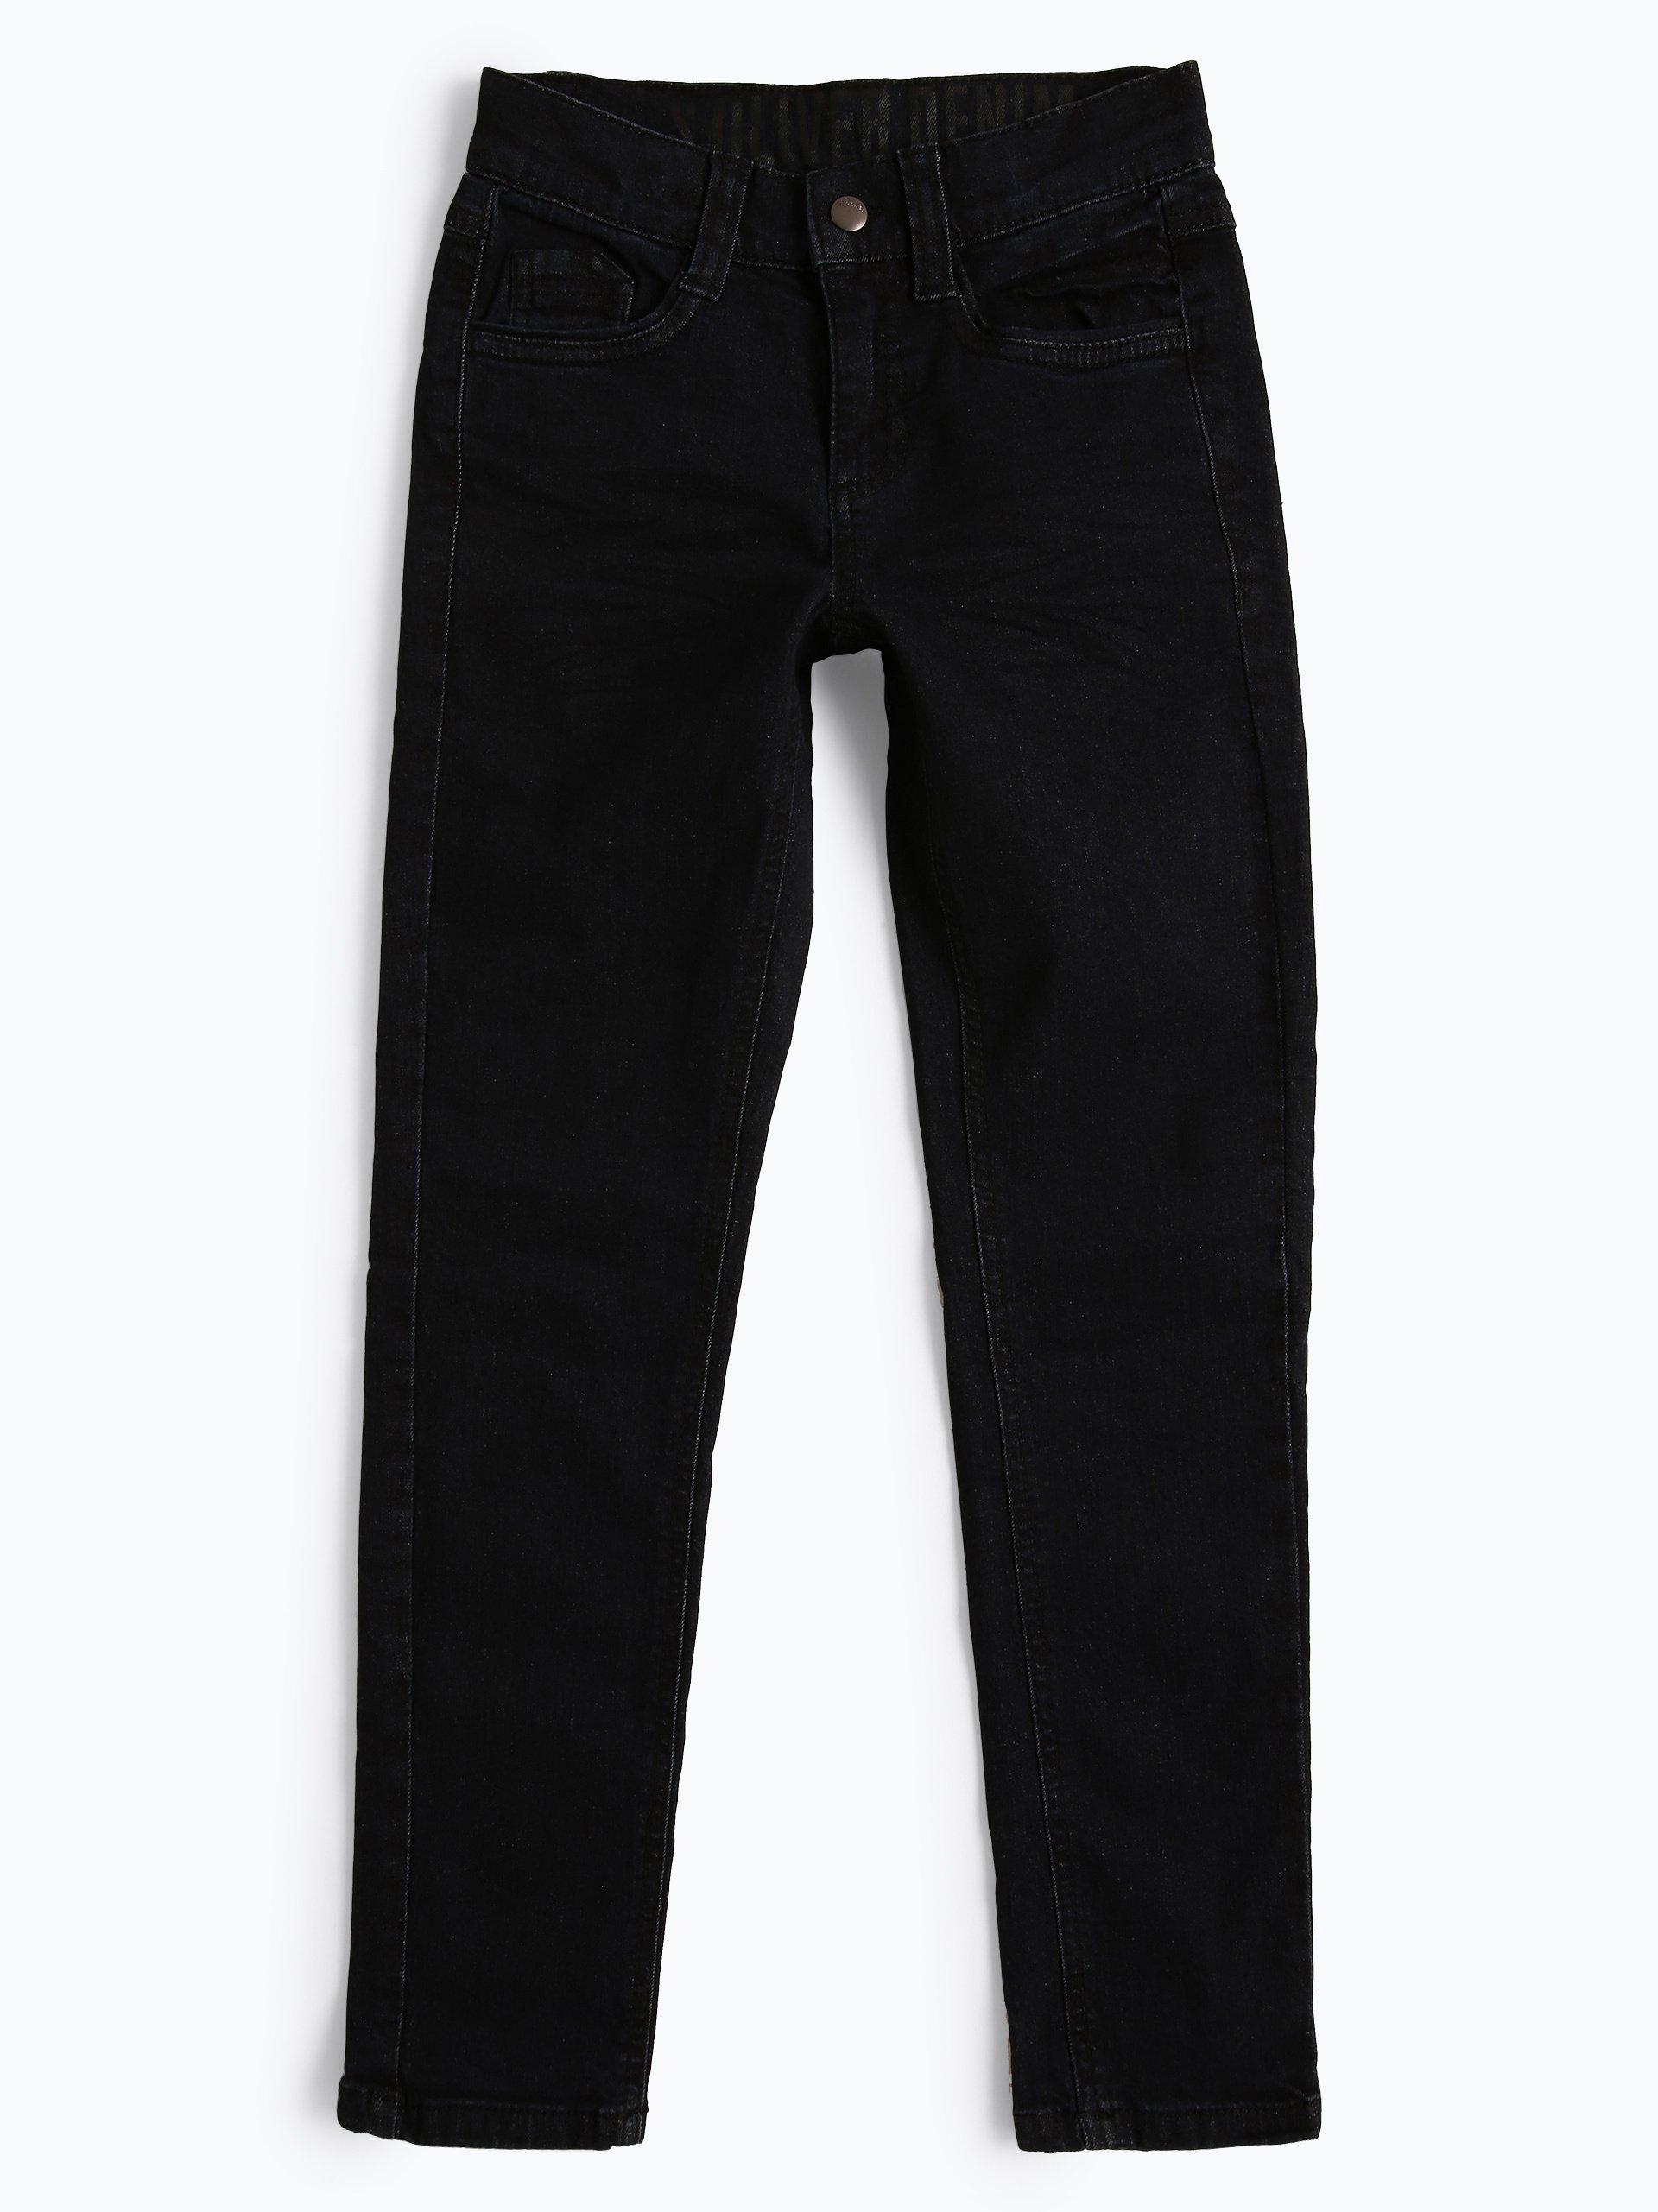 s.Oliver Casual Jungen Jeans Slim Fit Slim - Skinny Seattle